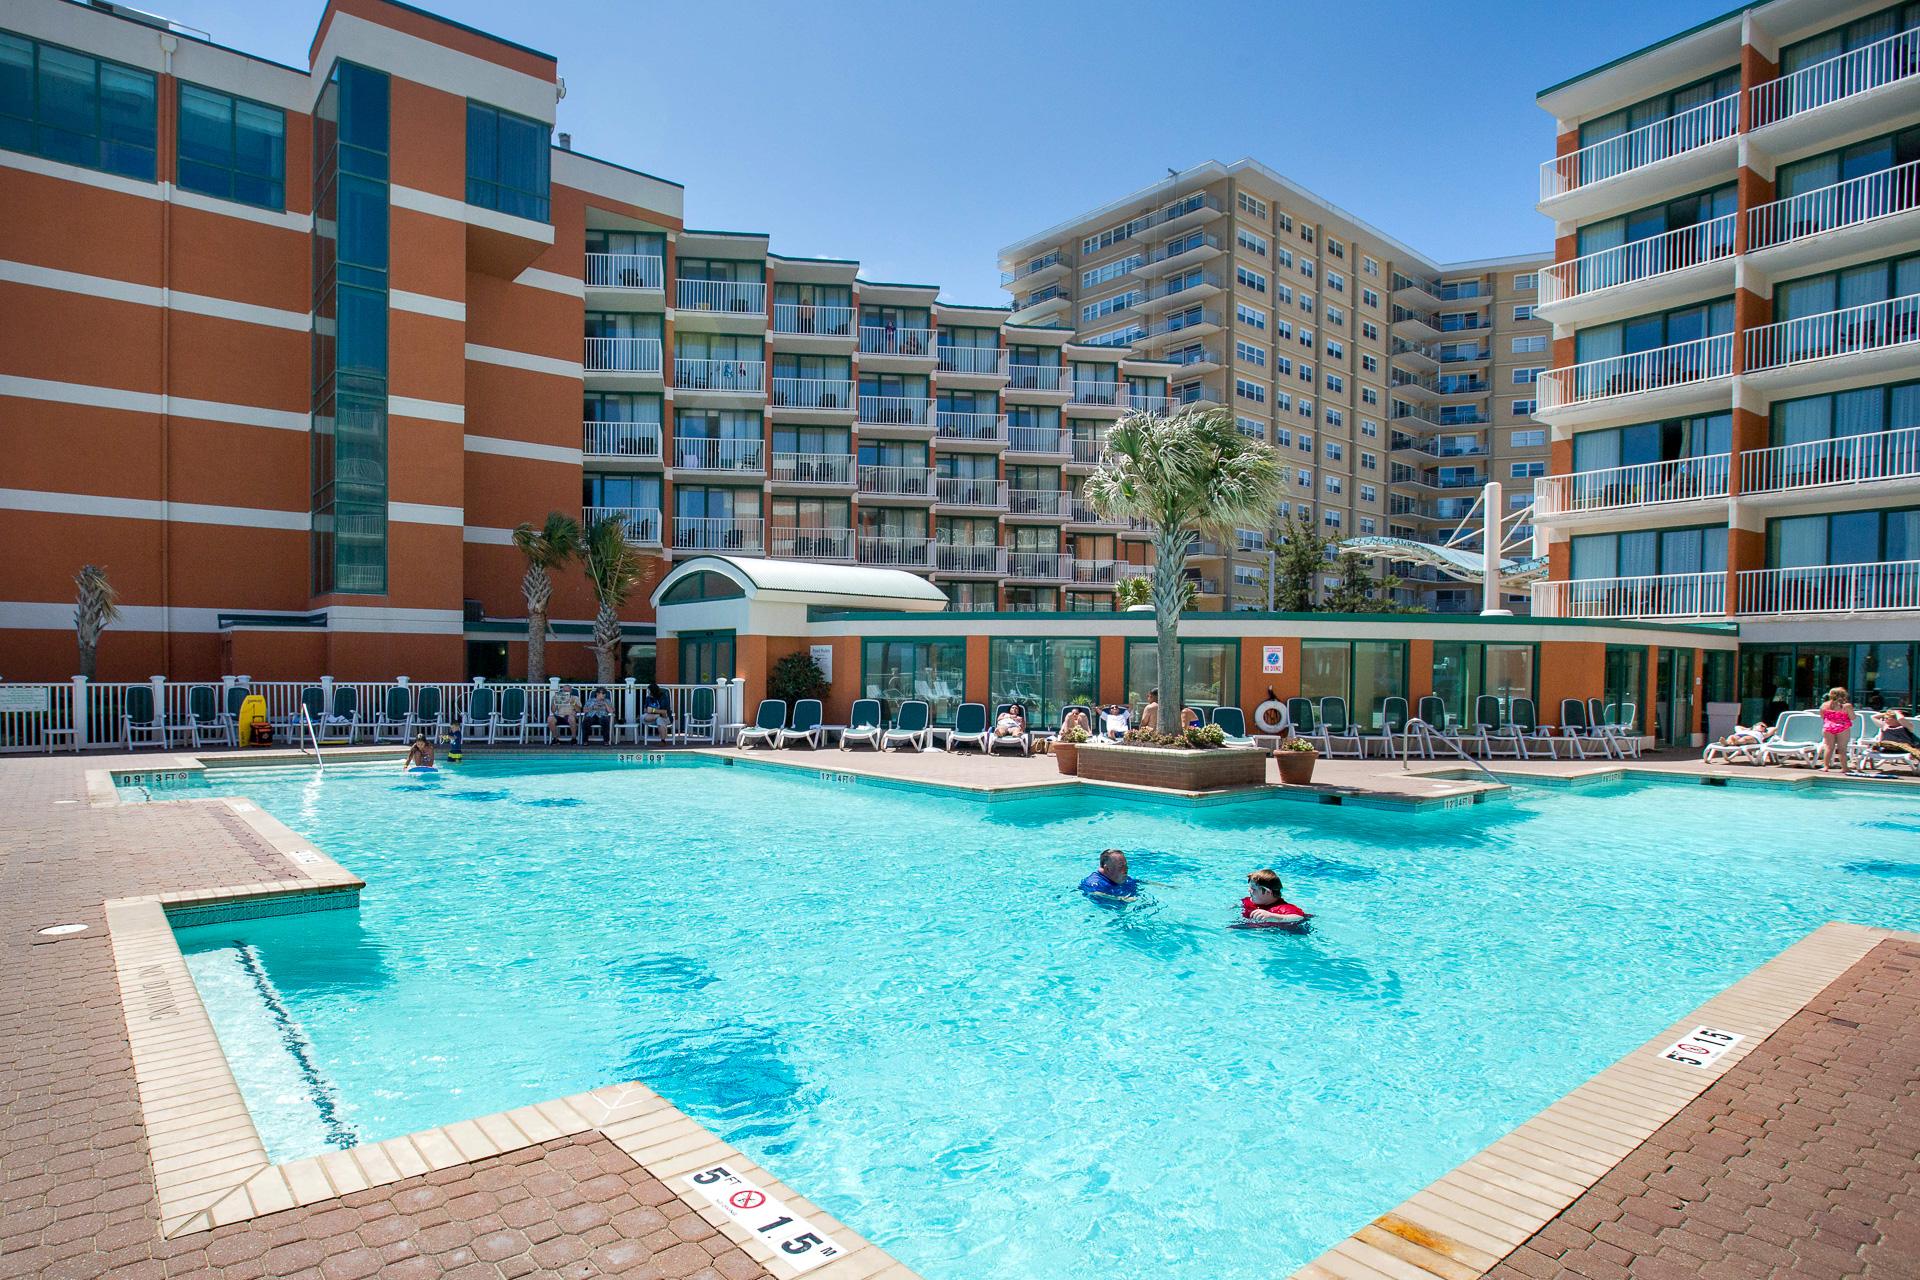 Holiday Inn & Suites North Beach pool; TripAdvisor Expert Photo